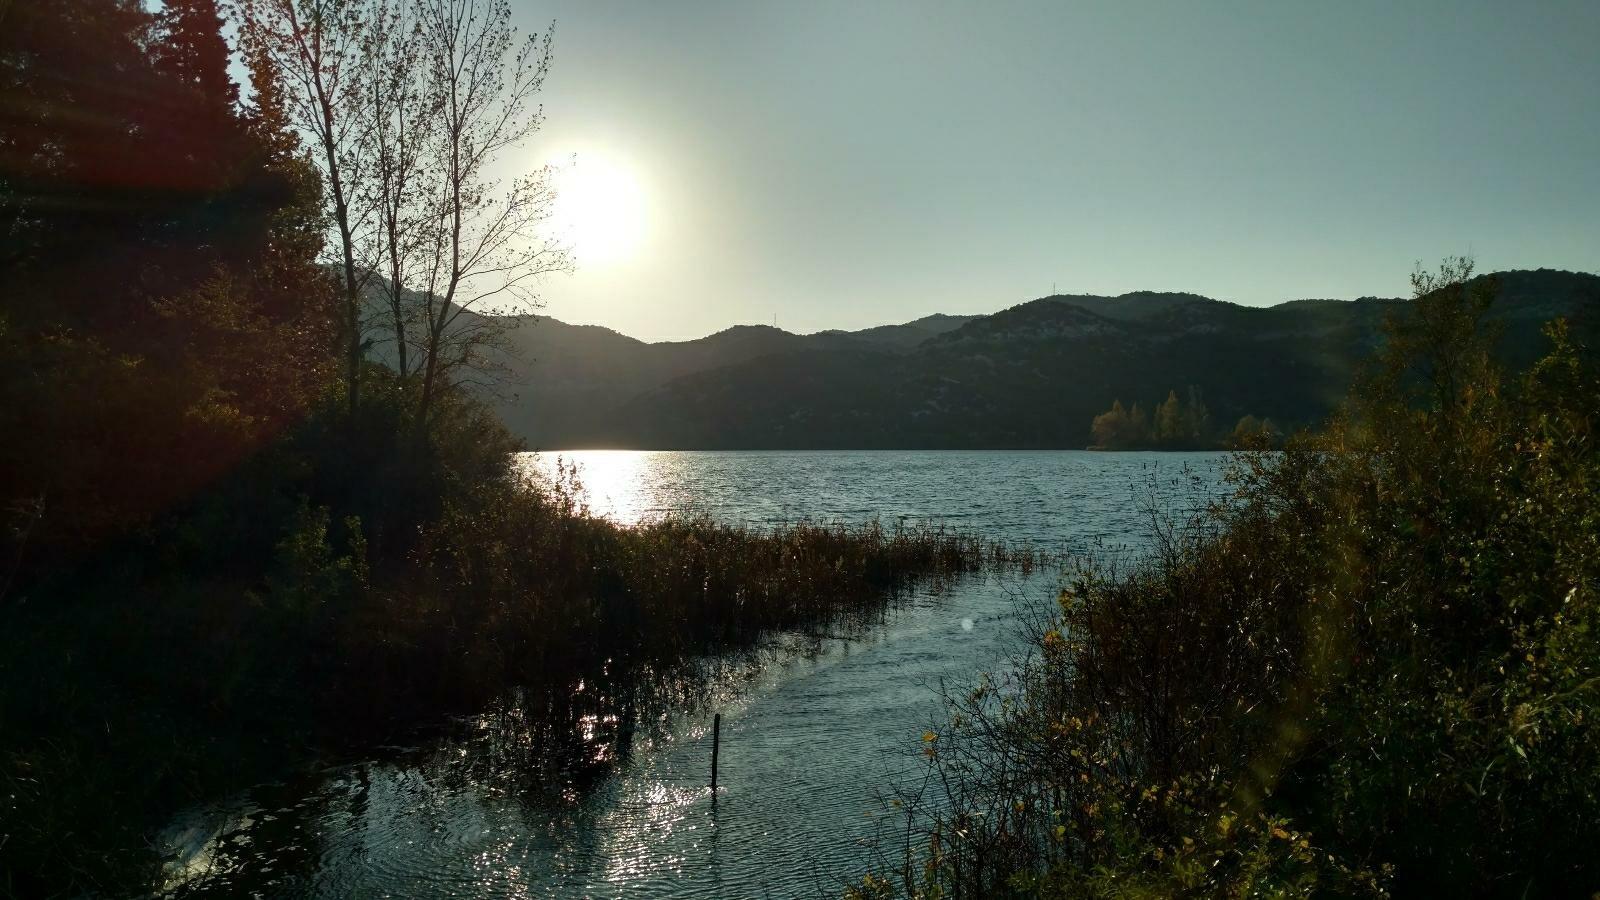 Blue Trail | 8-11 | Stage 19: Southeastern area of Biokovo, Baćinska jezera